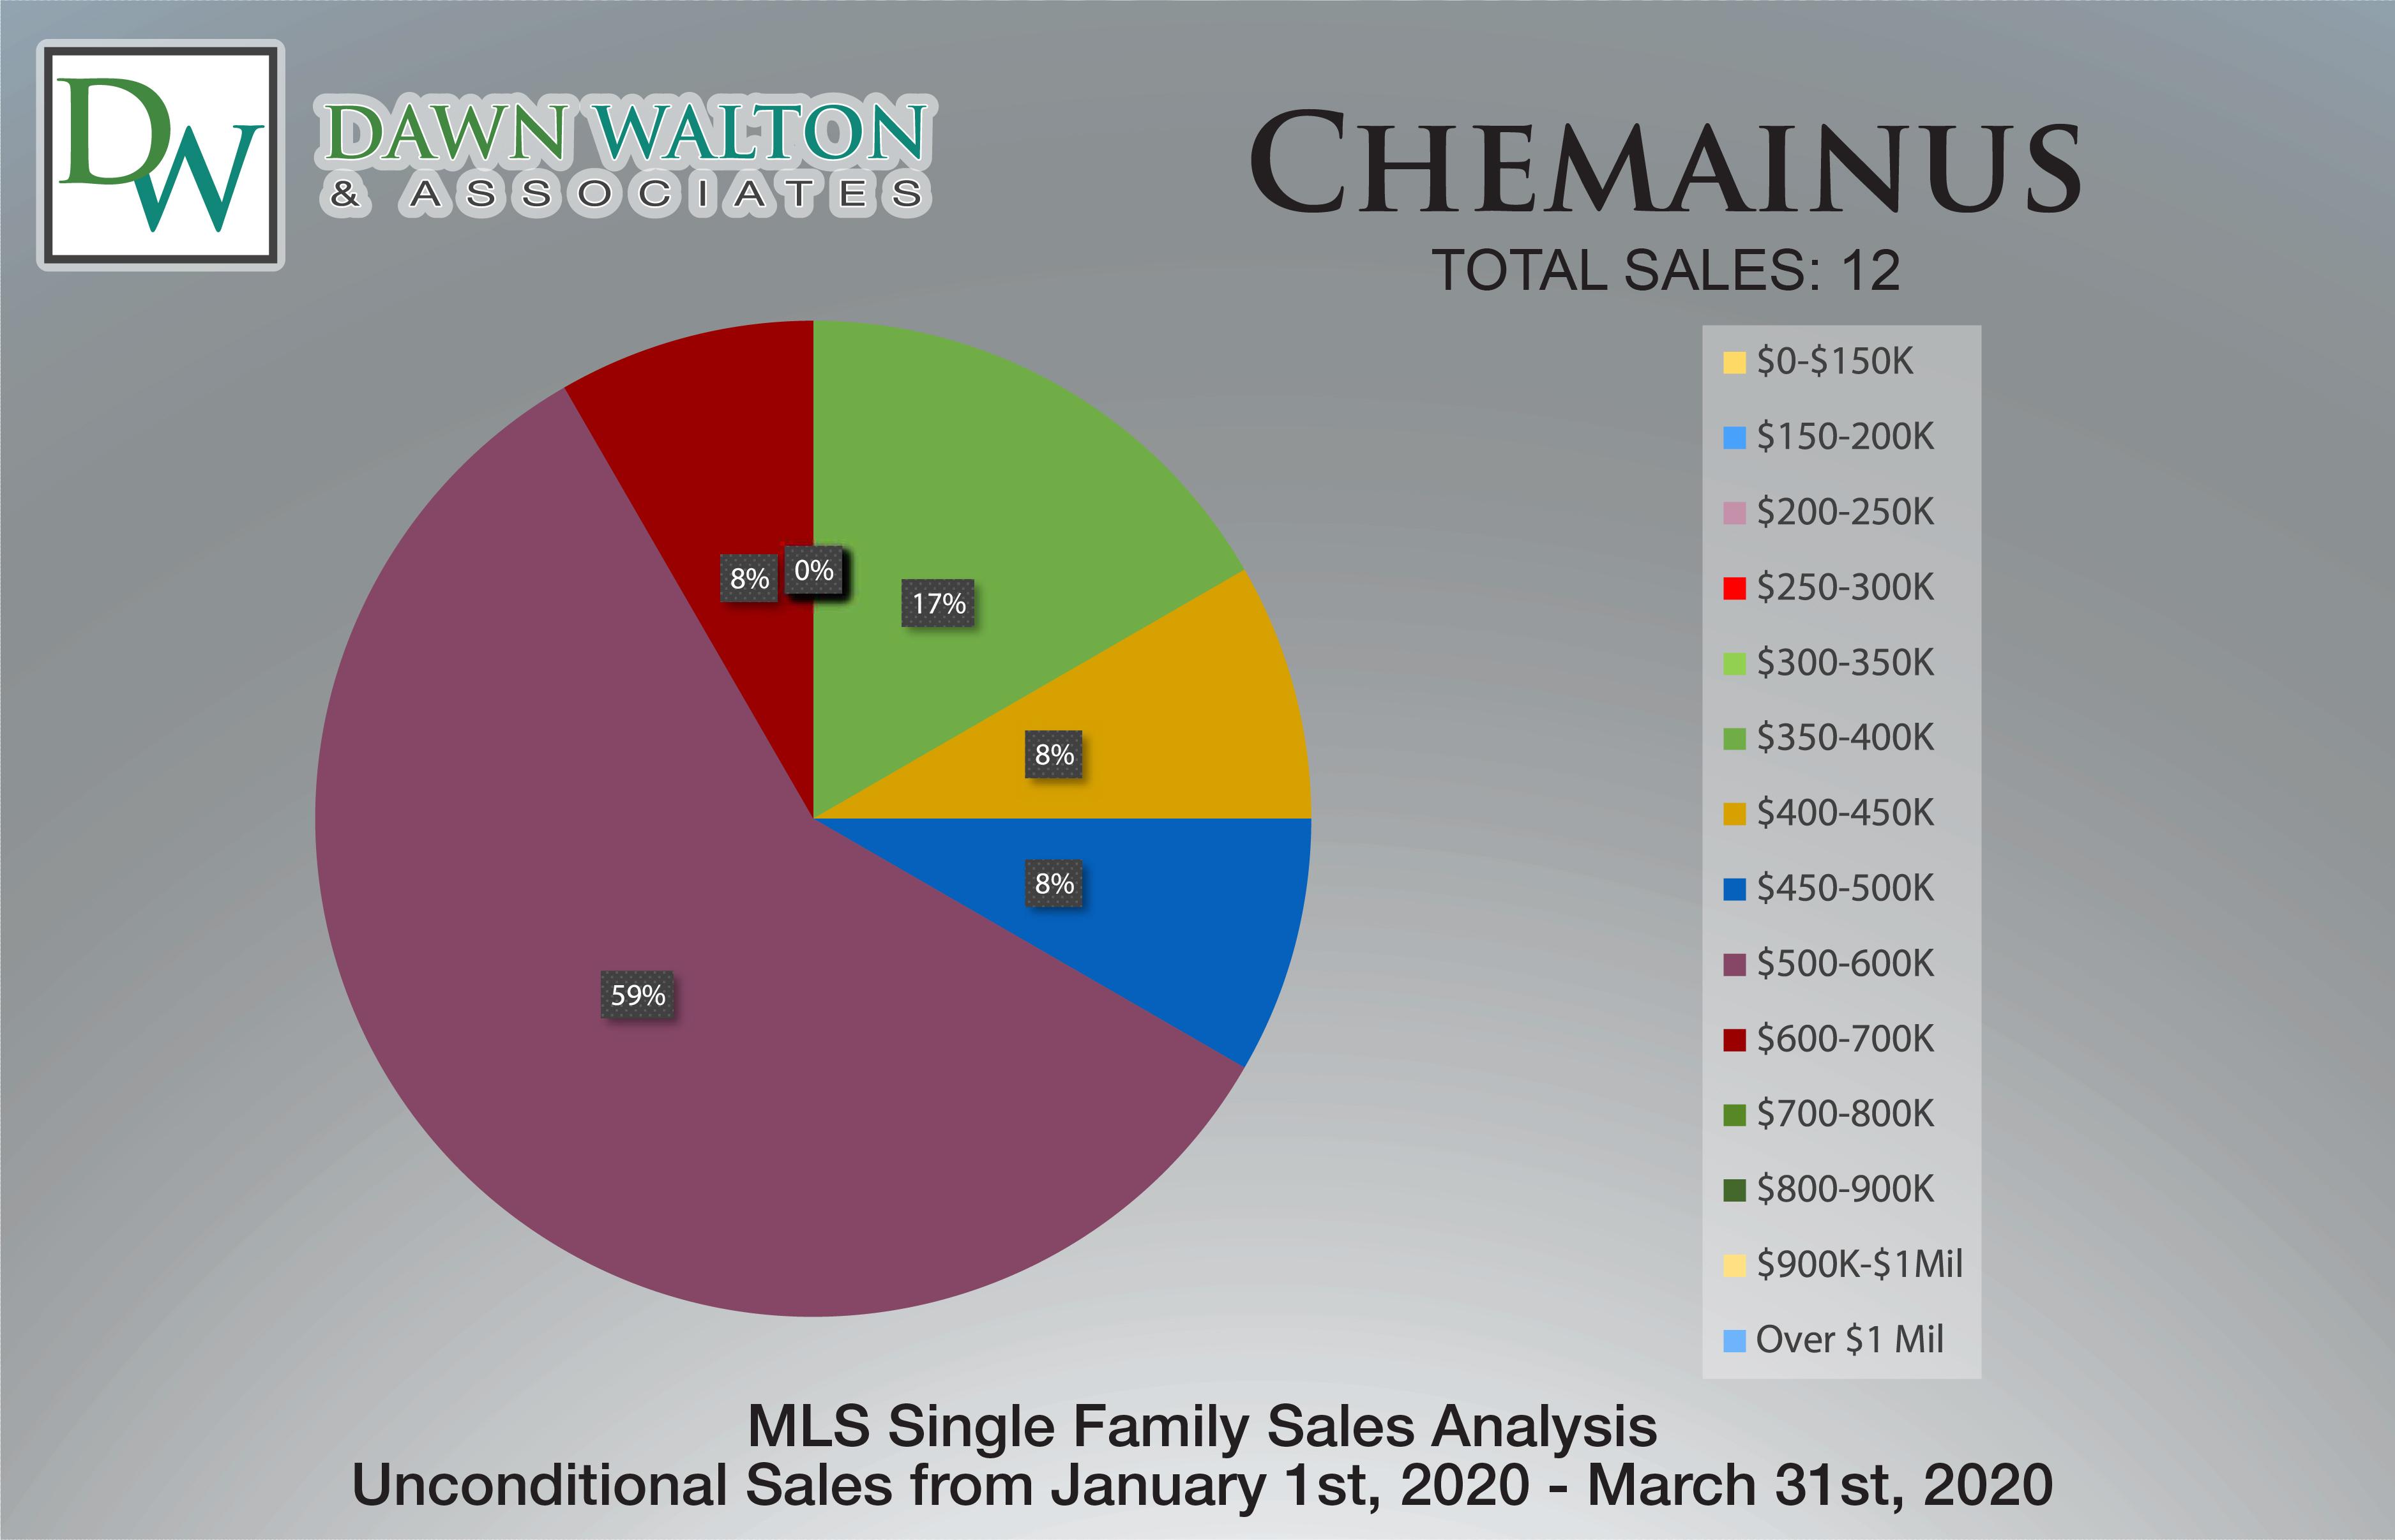 Chemainus Real Estate Market Stats Price Percentage Jan 1-Mar 31 2020 - Nanaimo Realtor Dawn Walton